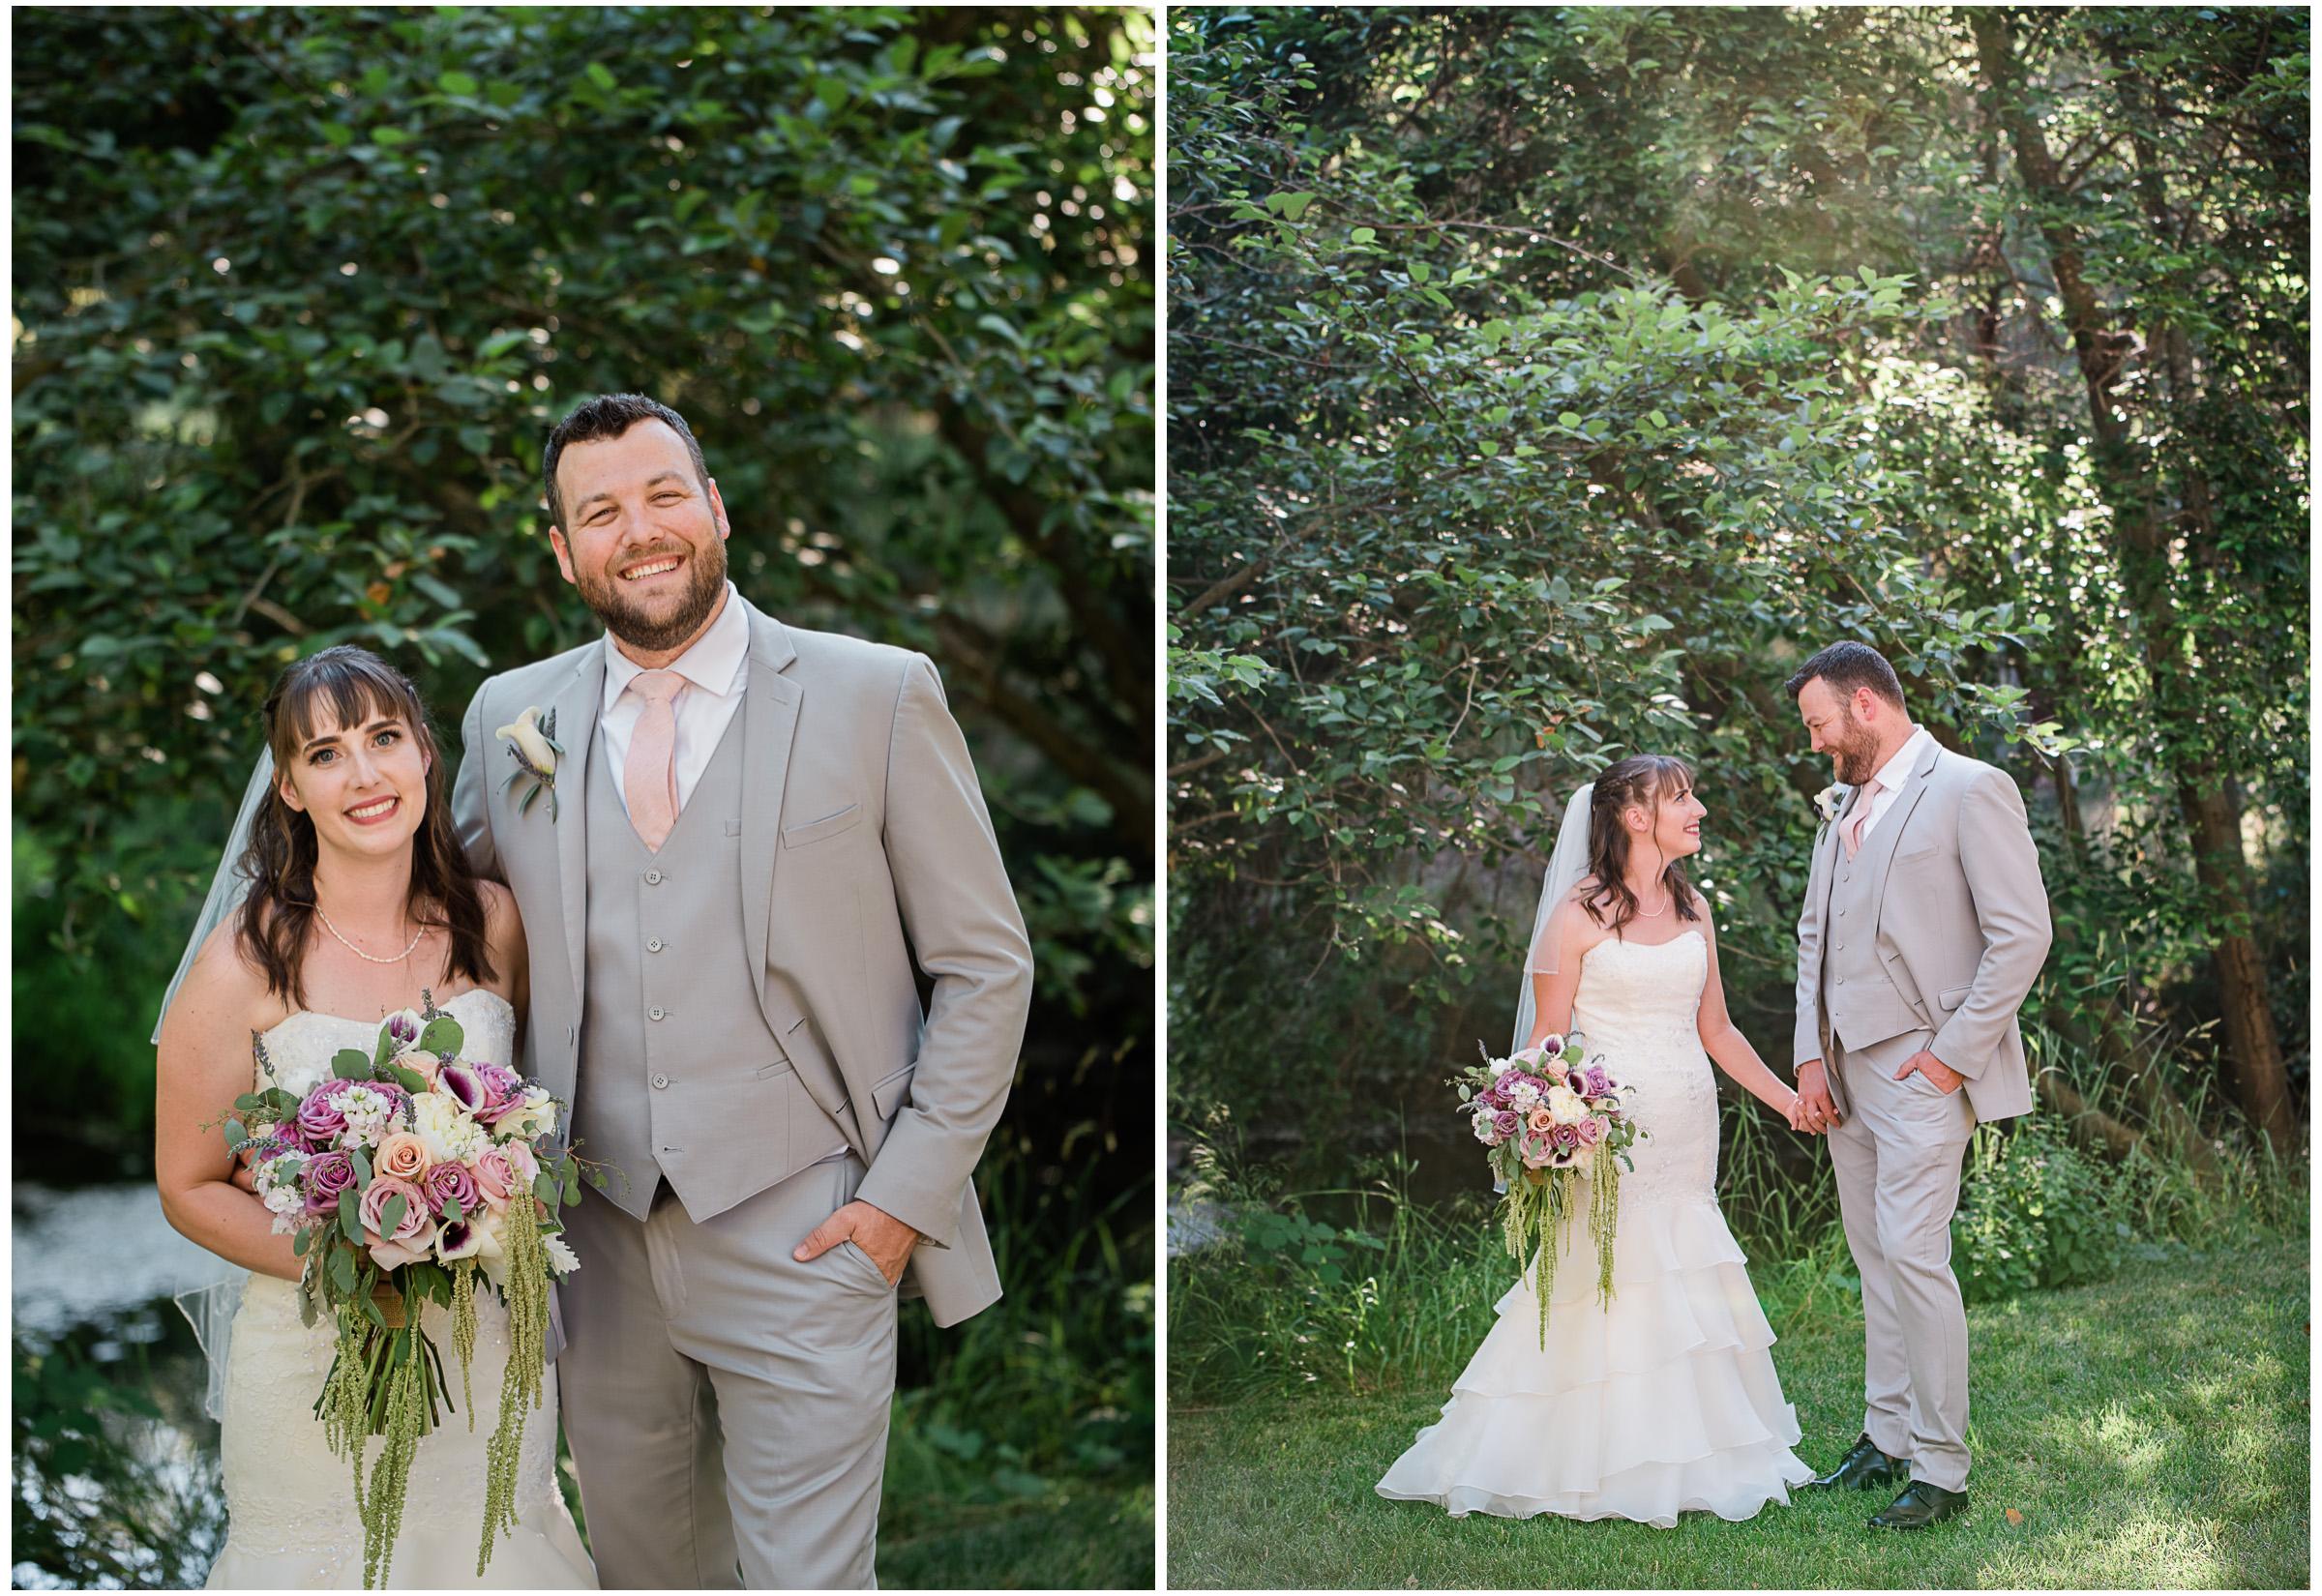 Placerville Wedding - Sacramento Photographer - Justin Wilcox Photography - 14.jpg